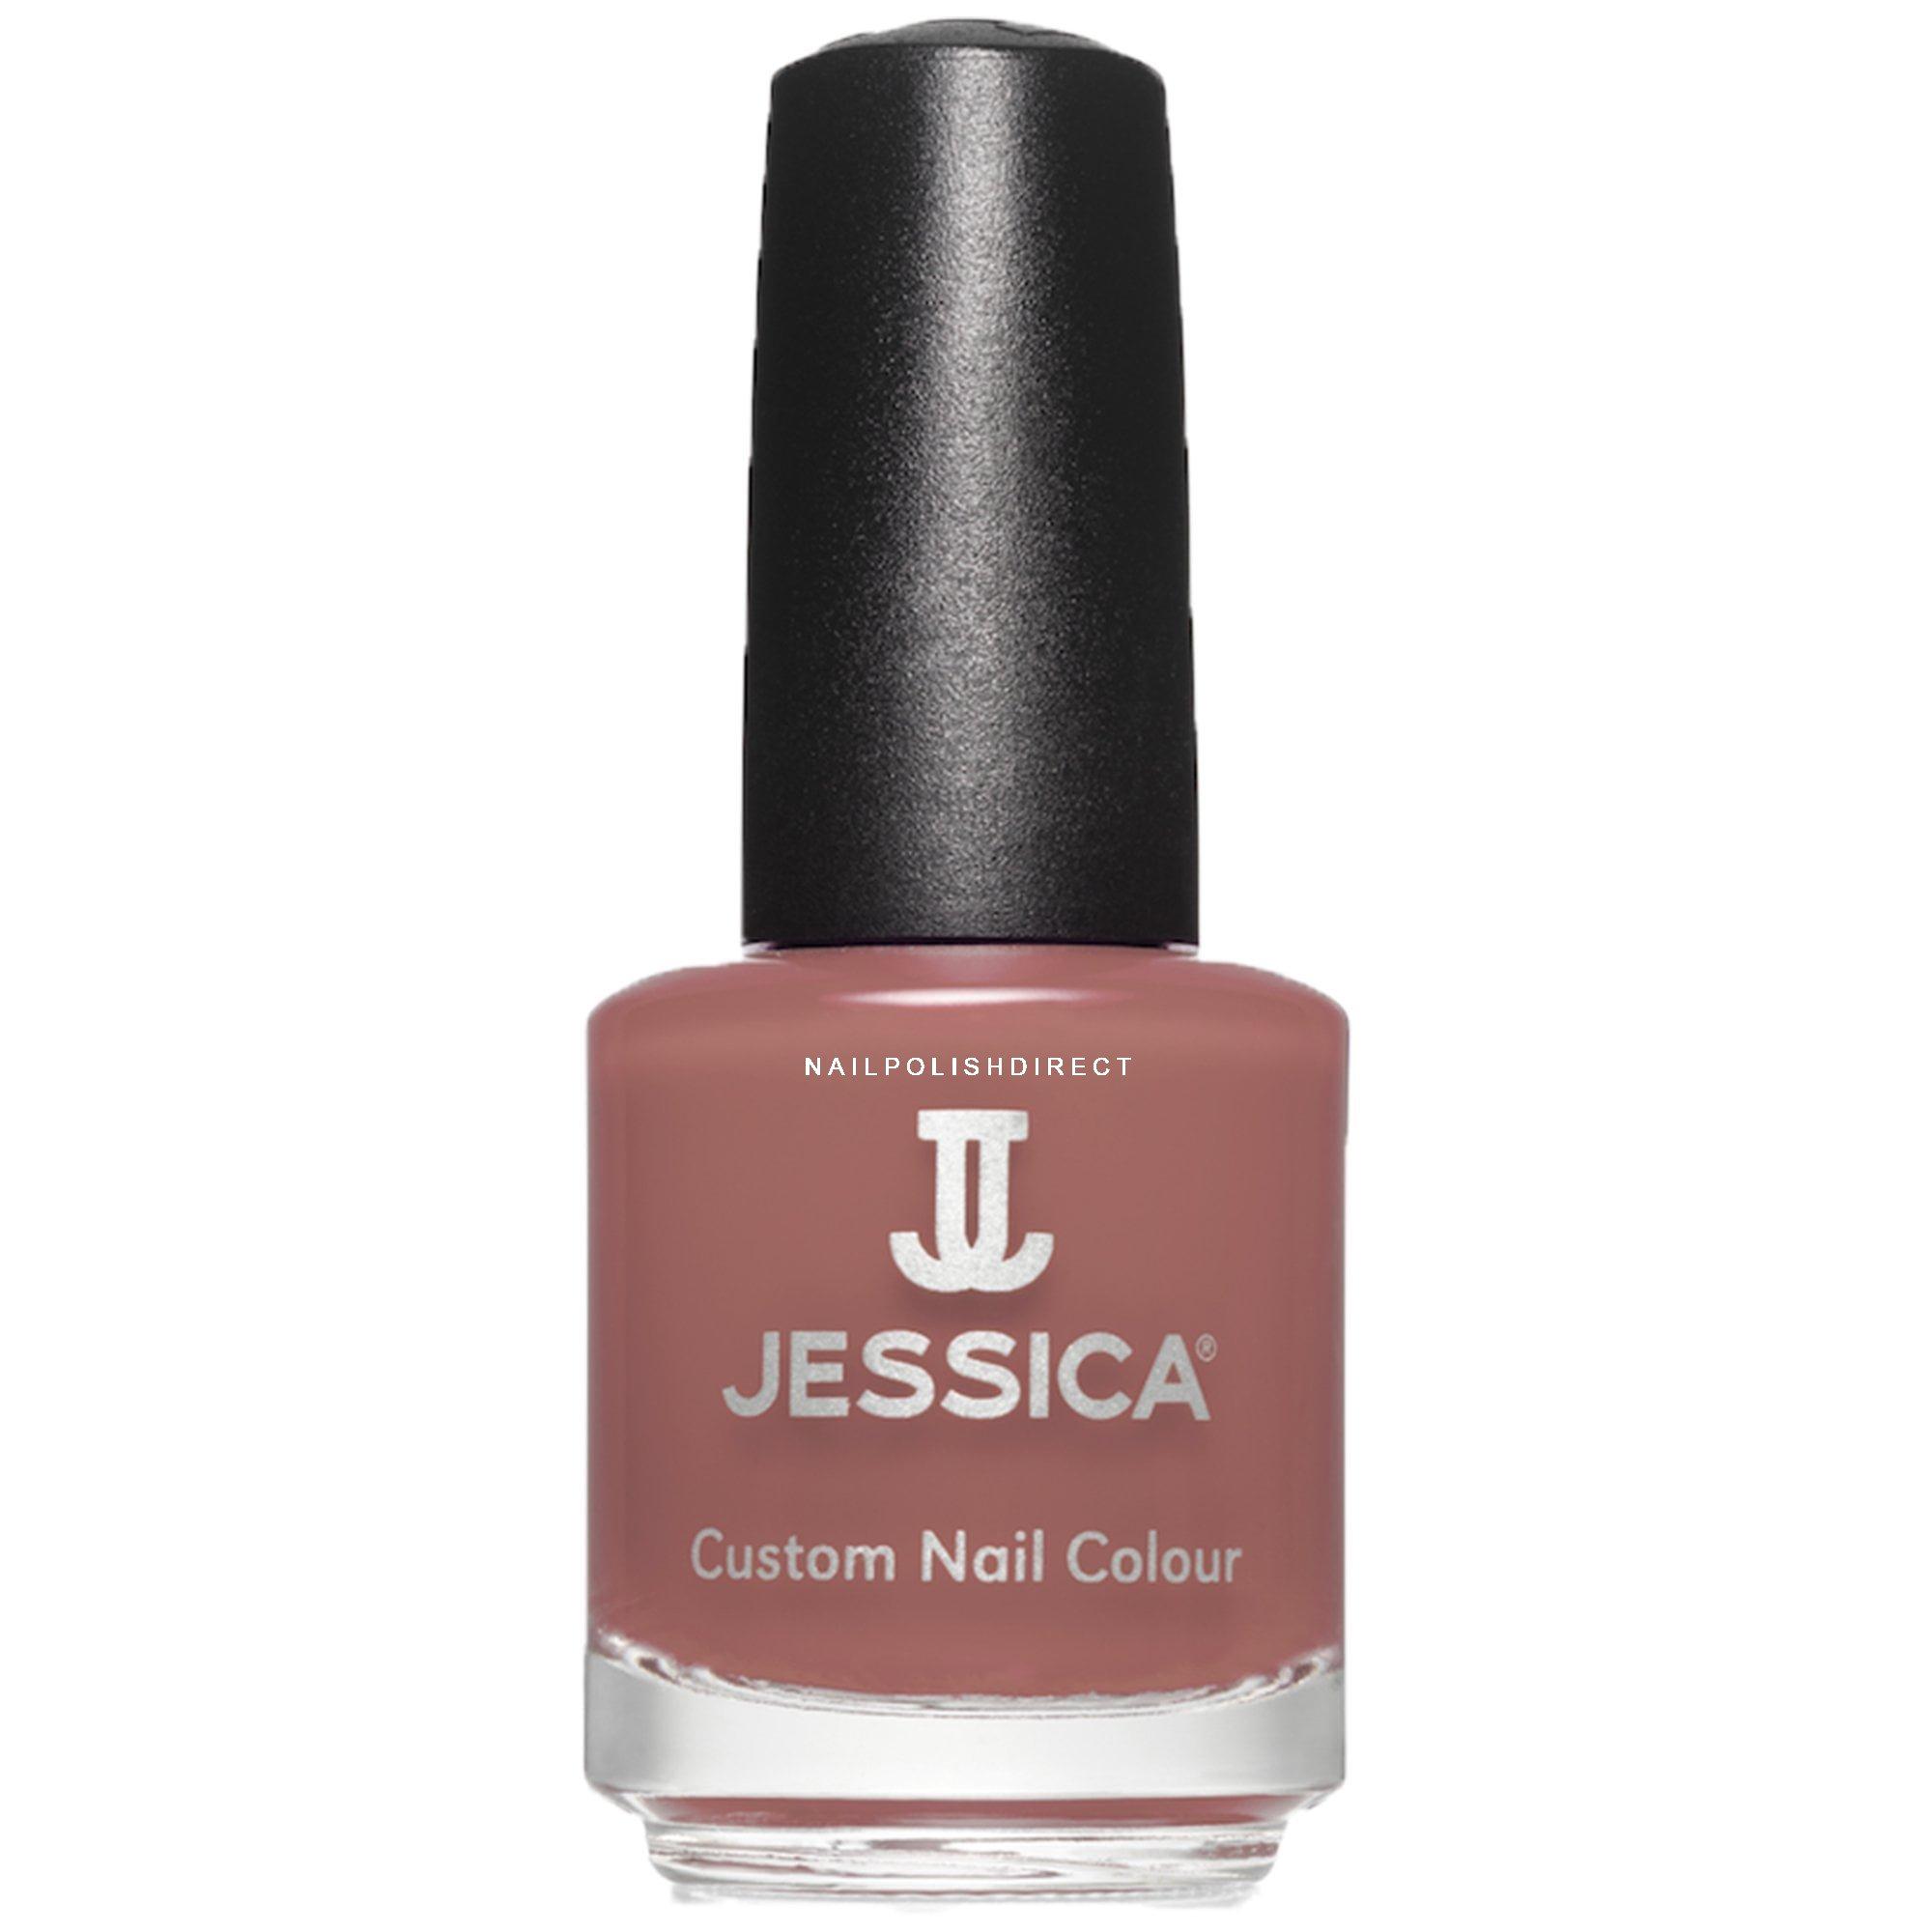 Jessica Orange Nail Polish: Jessica Autumn Romance Collection